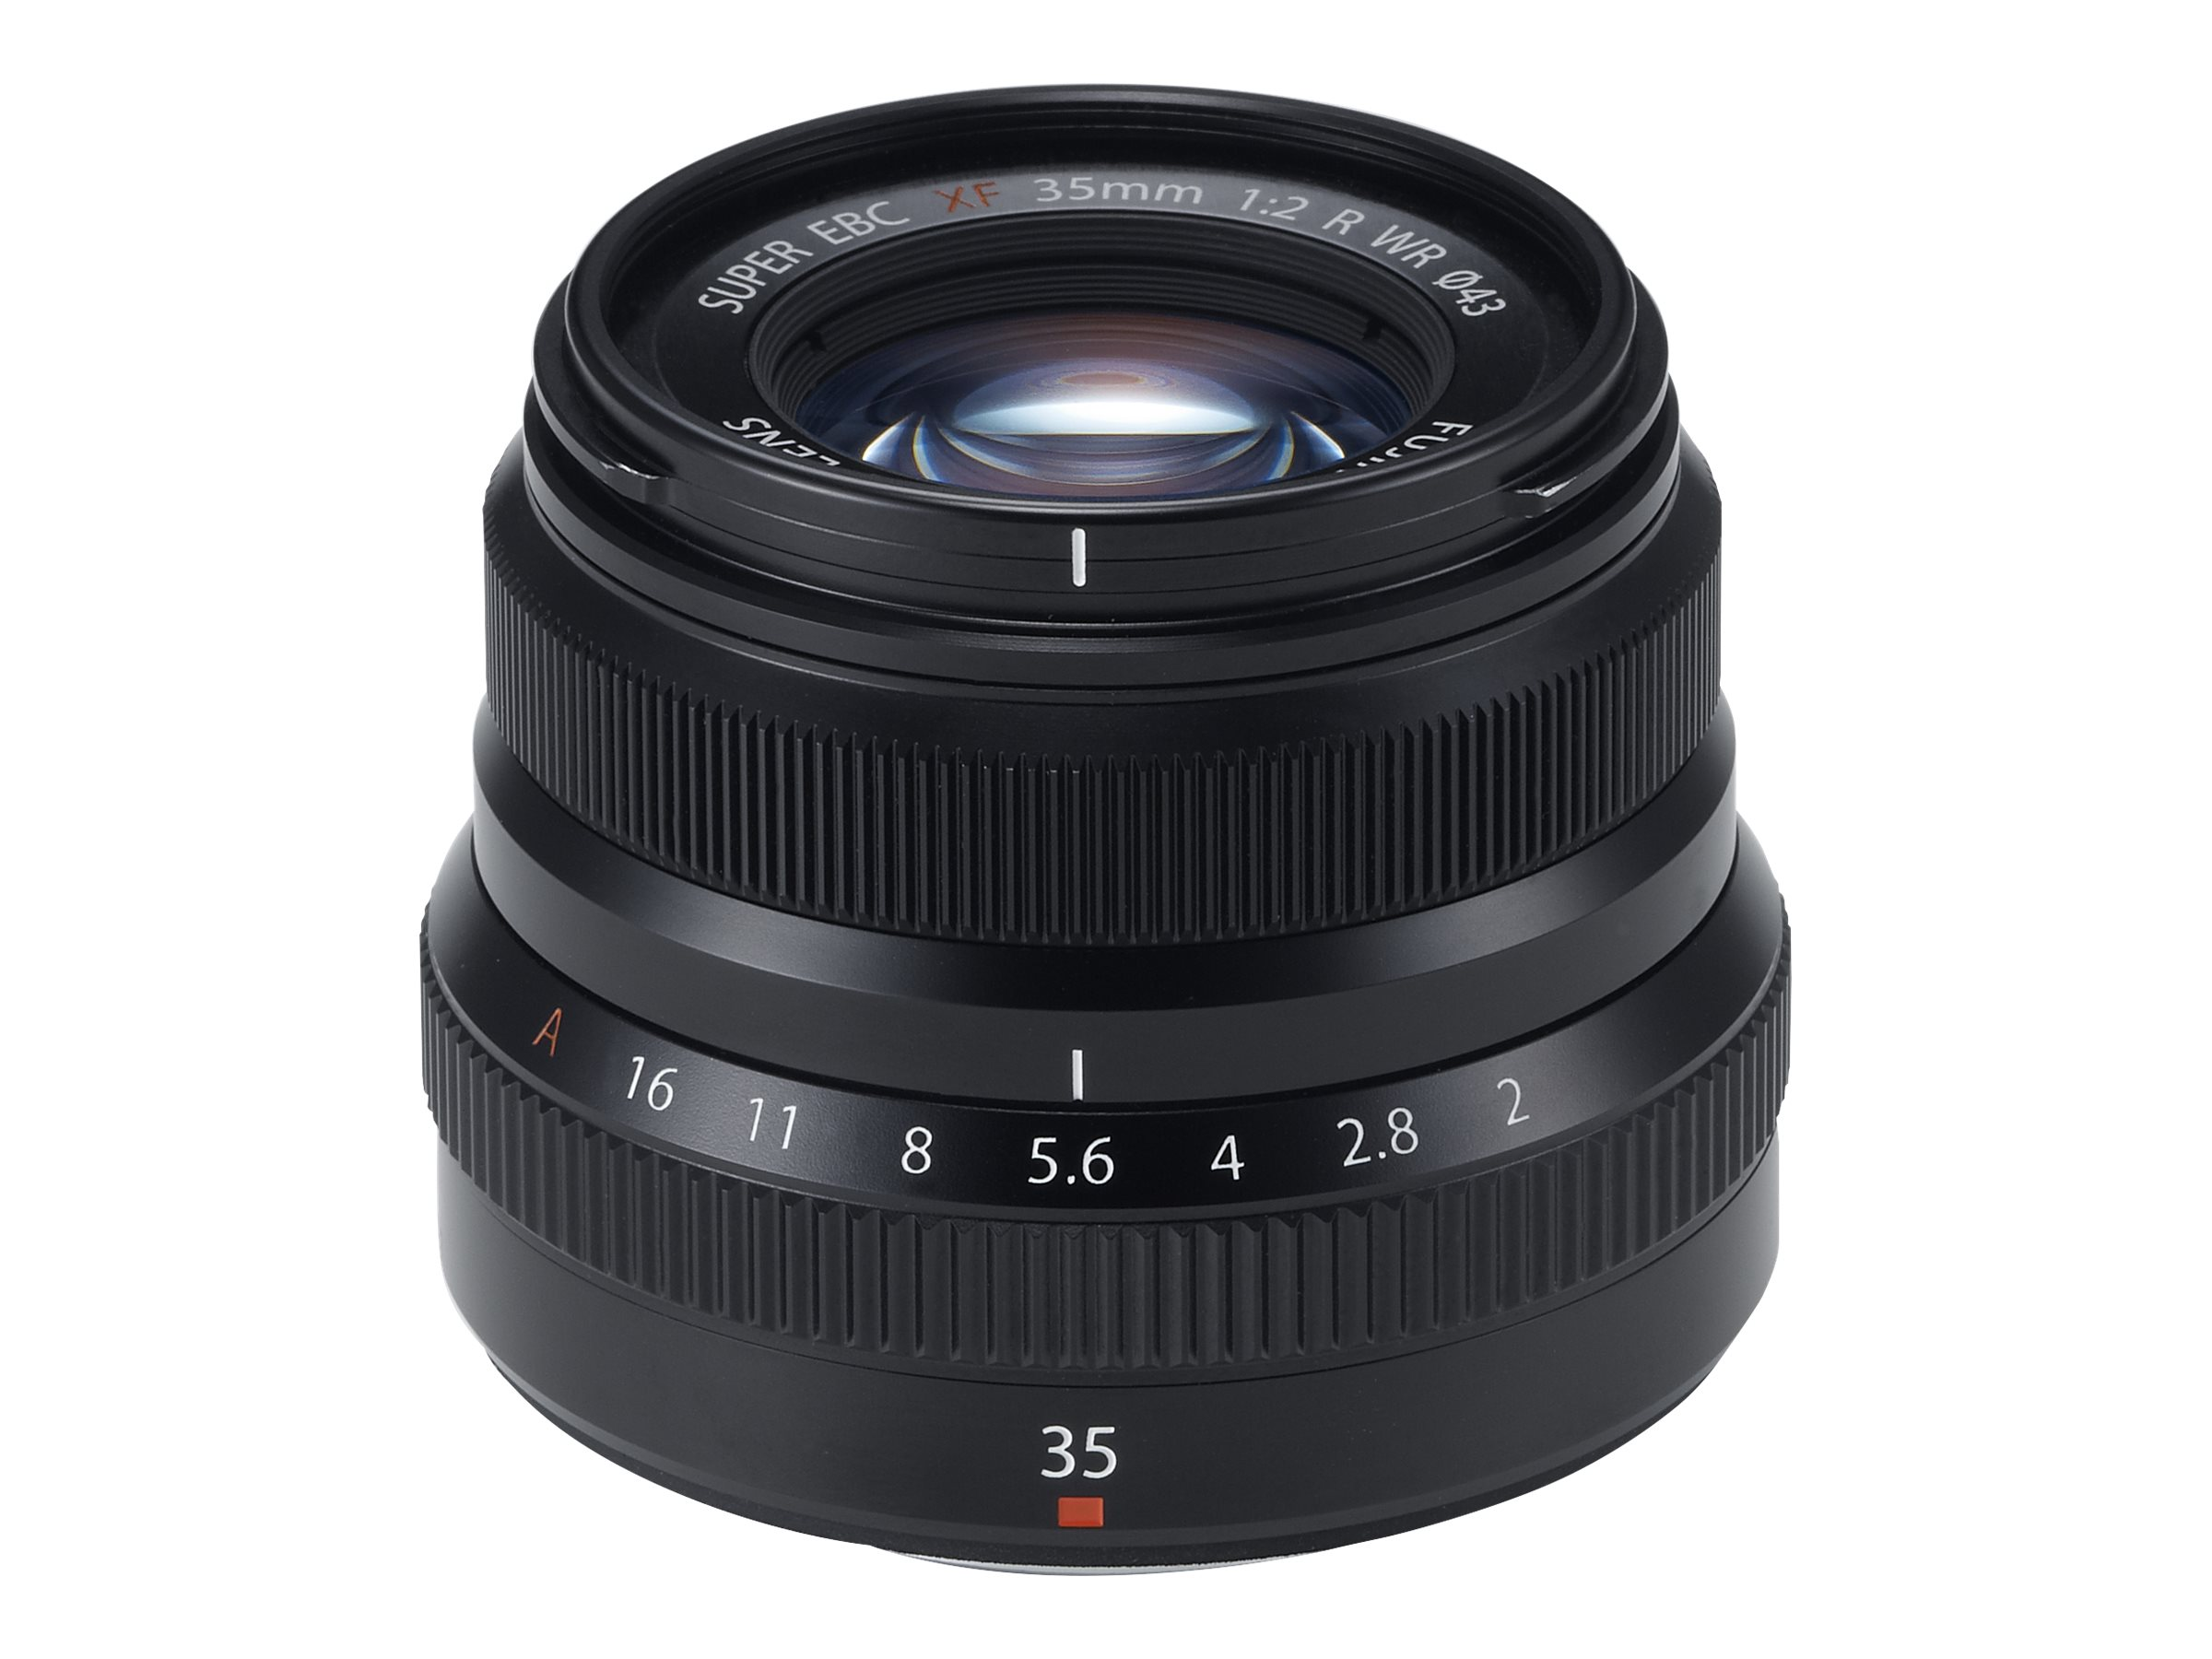 Fujinon XF - Objektiv - 35 mm - f/2.0 R WR - Fujifilm X Mount - für X Series X-A10, X-A3, X-A5, X-E3, X-H1, X-T100, X-T3